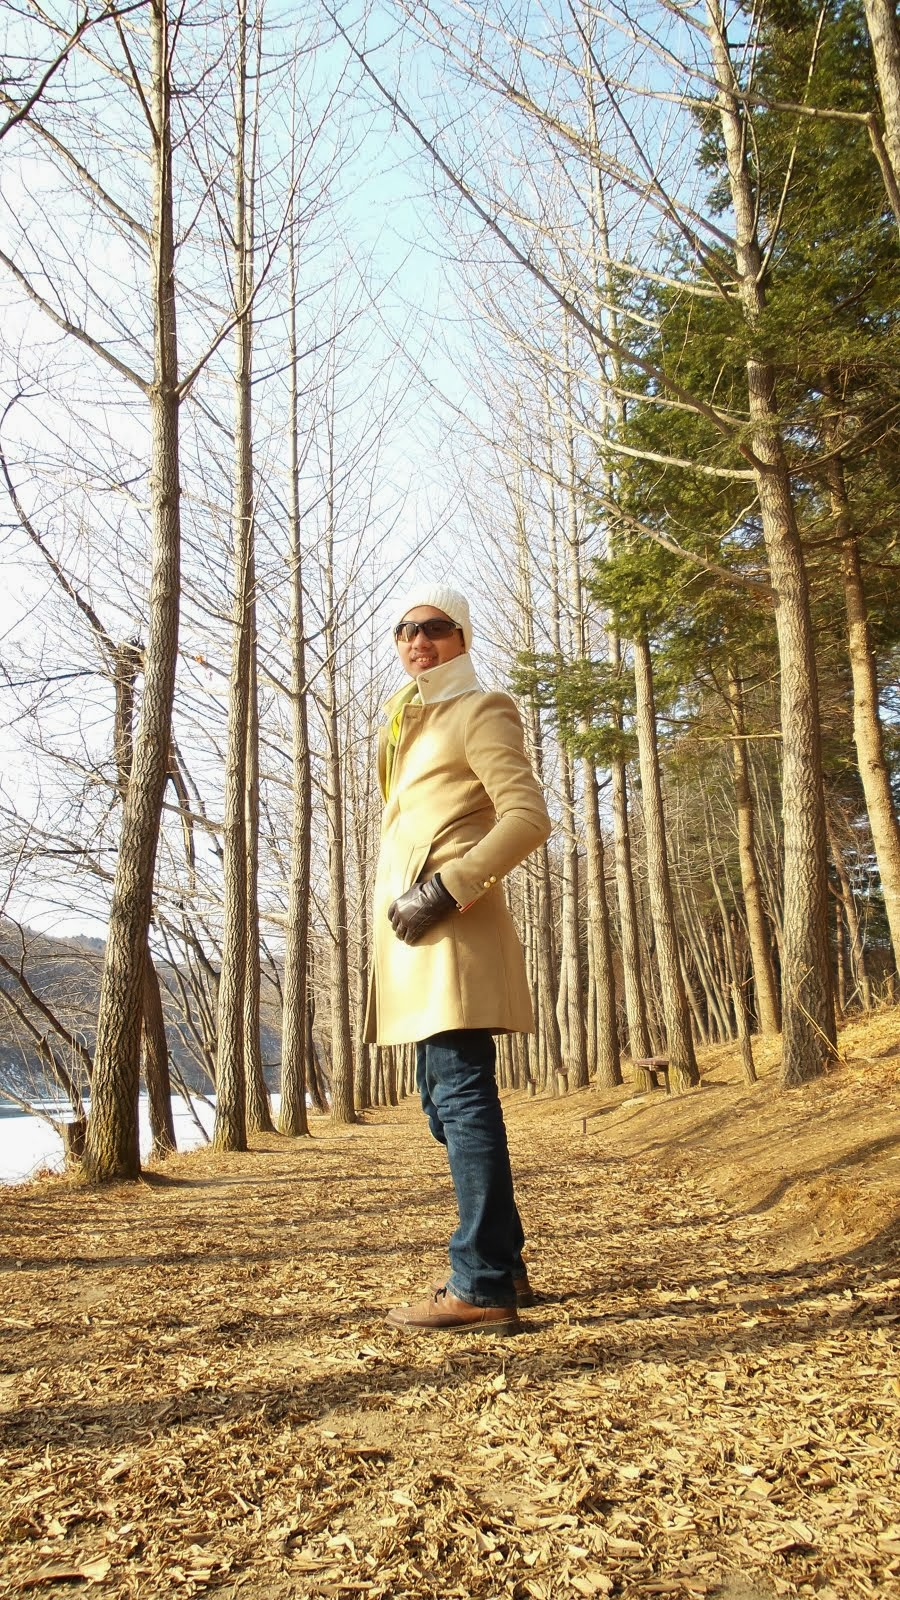 NAMI ISLAND, KOREA